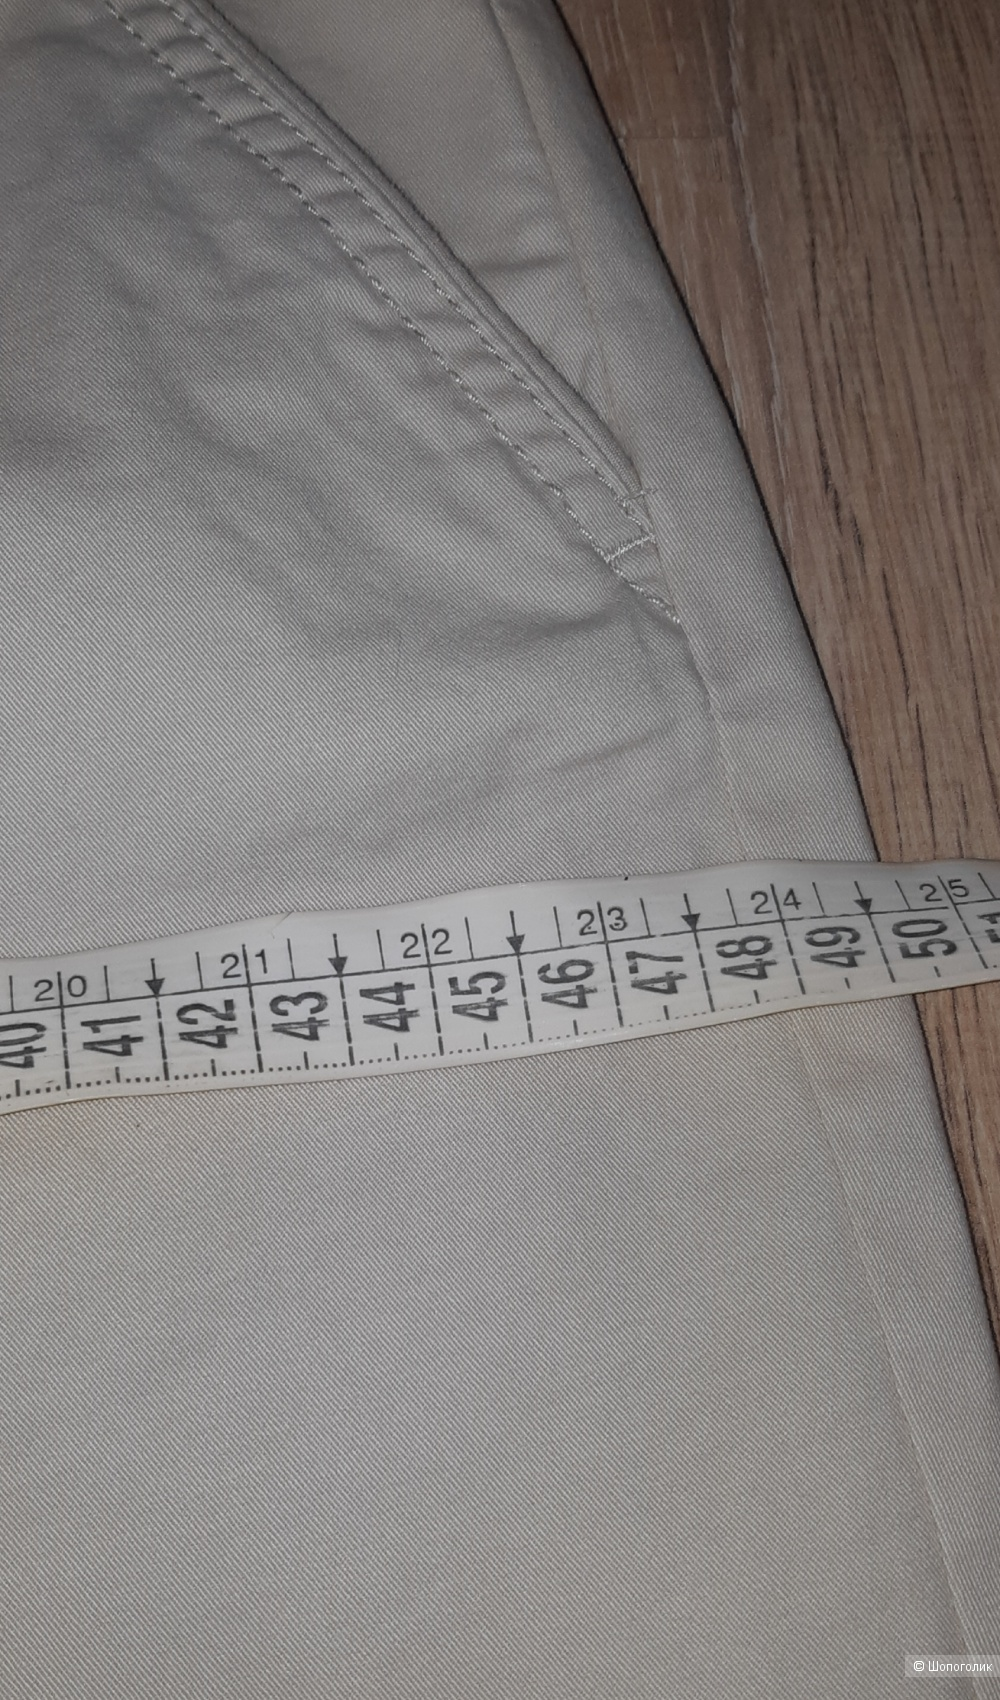 Брюки-чиносы superdry, размер 46